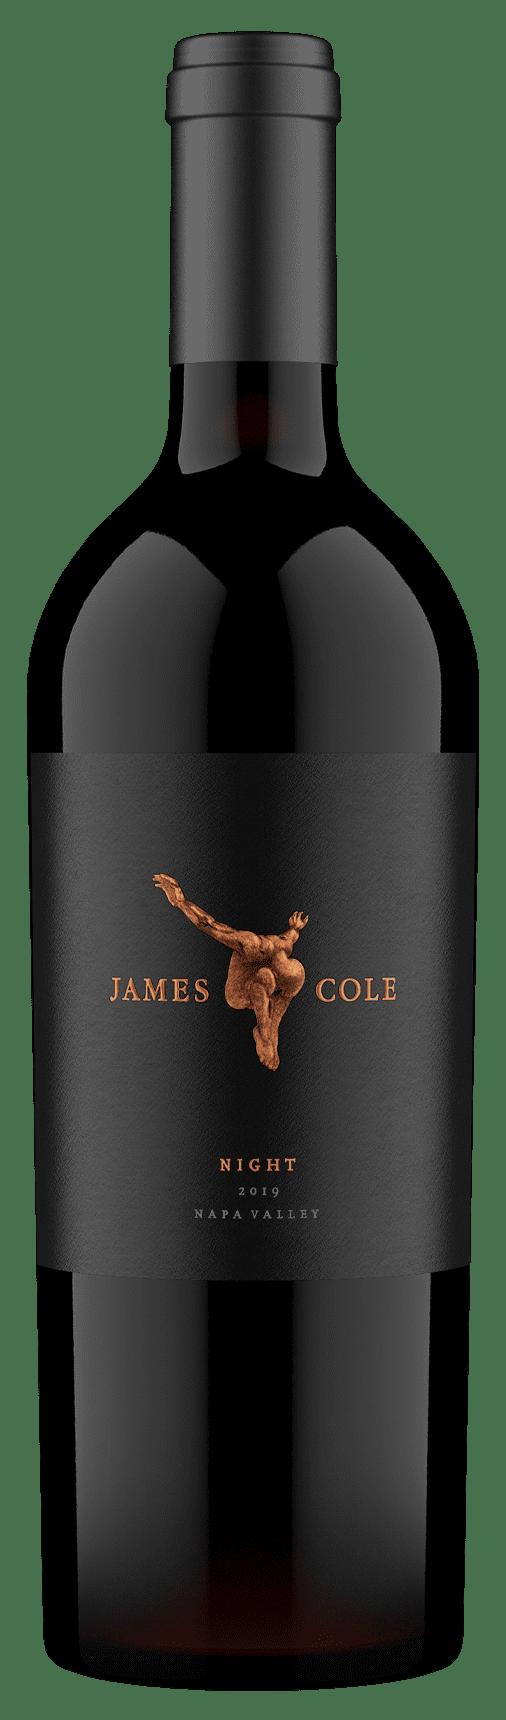 2019 Night Red Wine